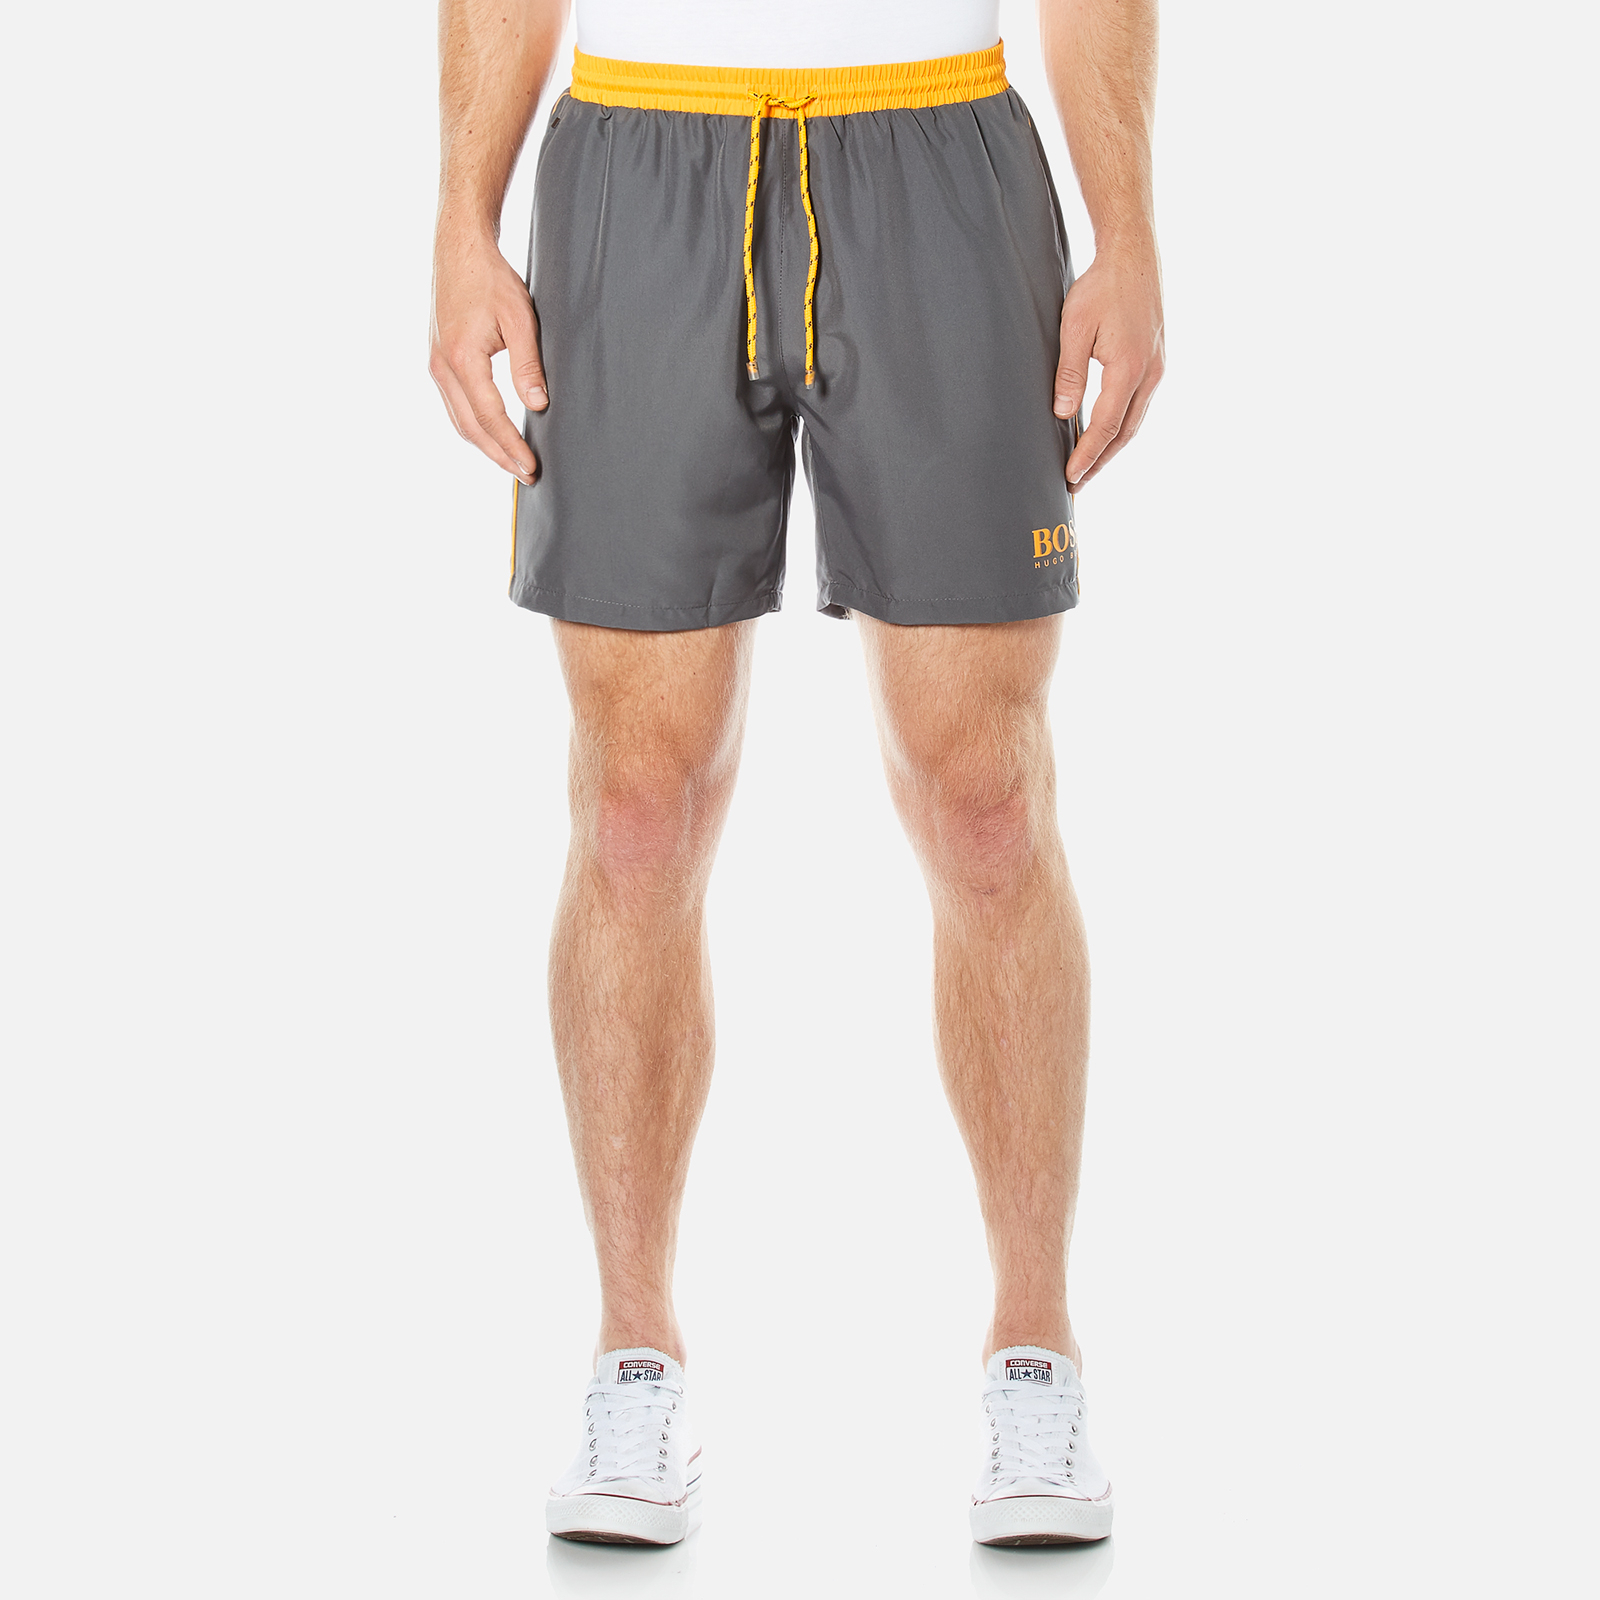 067094bbfa BOSS Hugo Boss Men's Starfish Swim Shorts - Dark Grey - Free UK Delivery  over £50